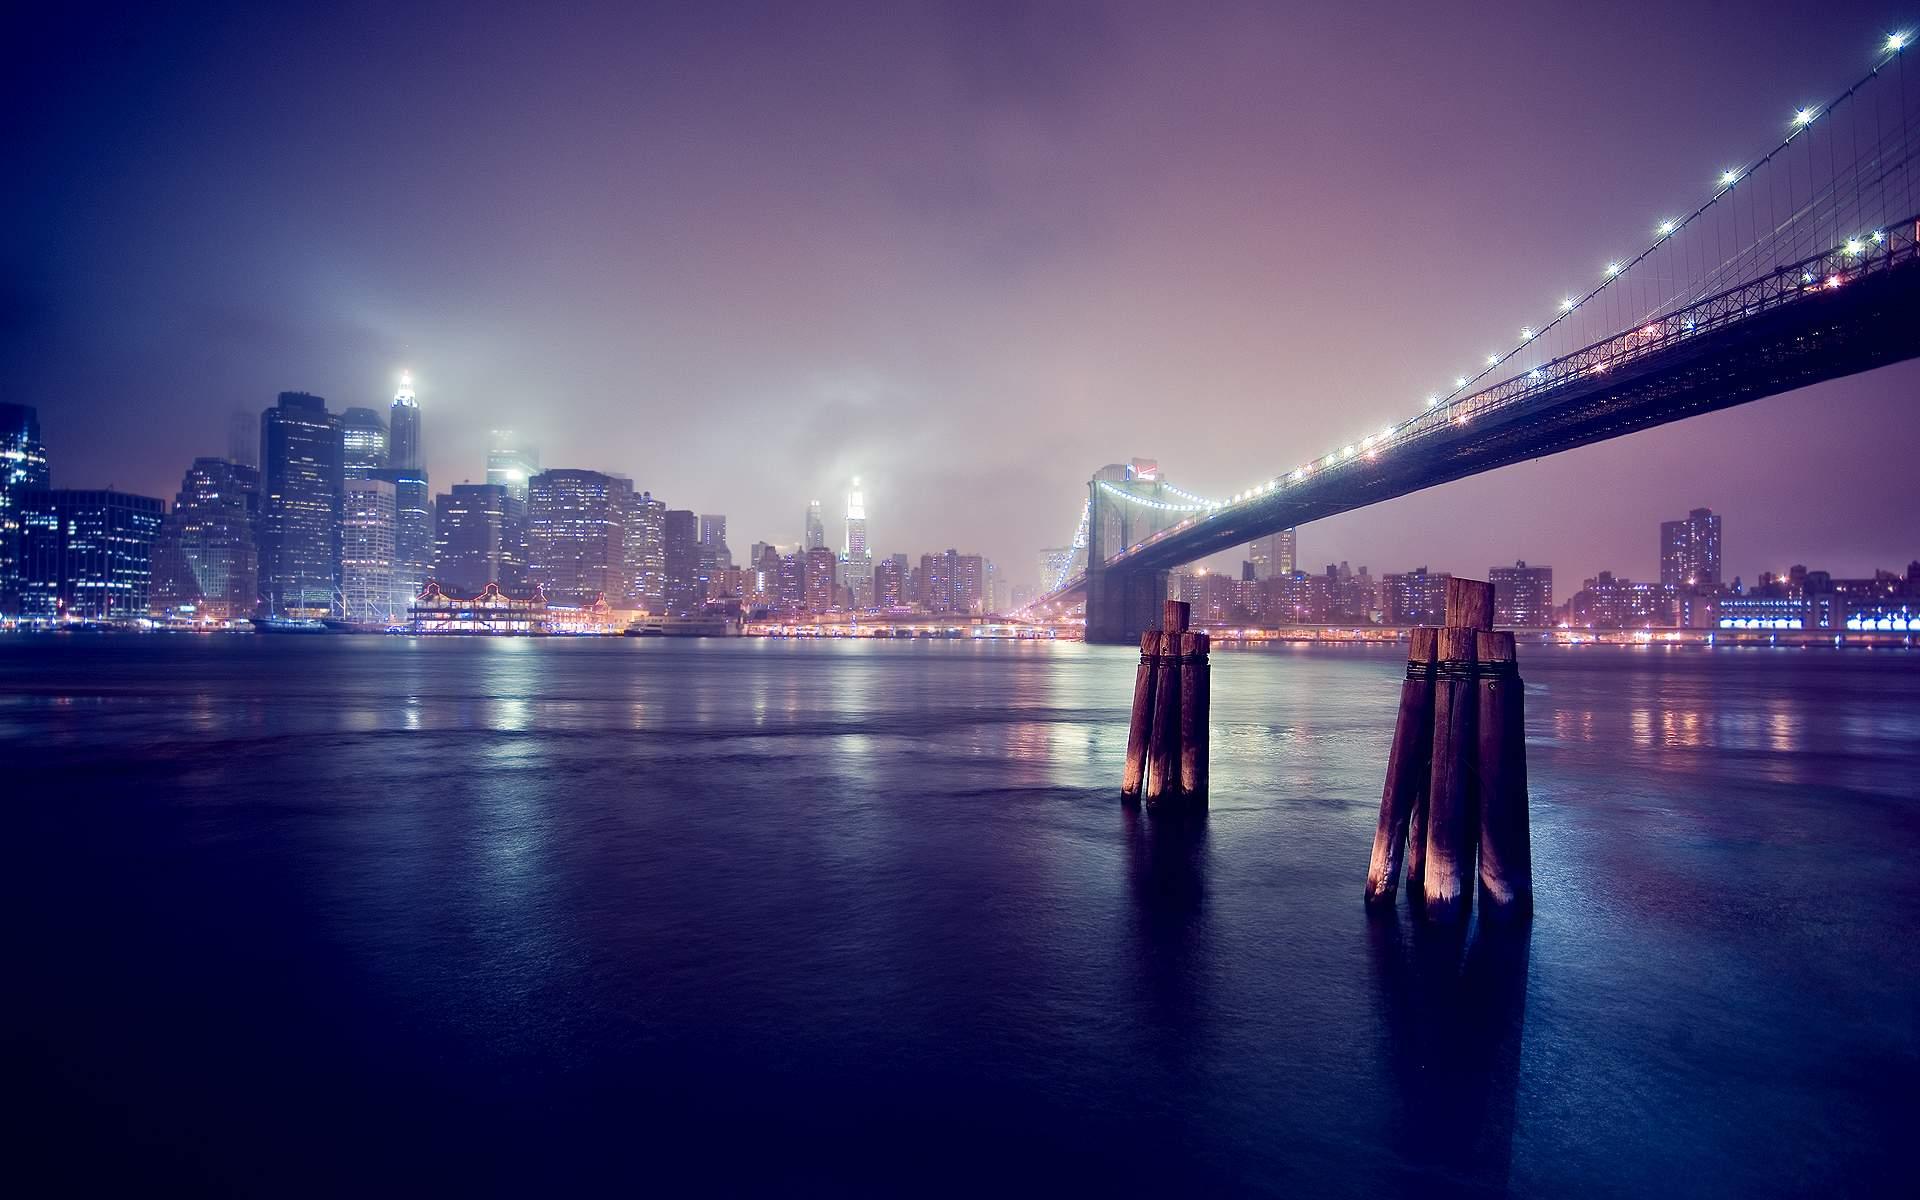 Very Pleasant View City Bridge Wallpaper